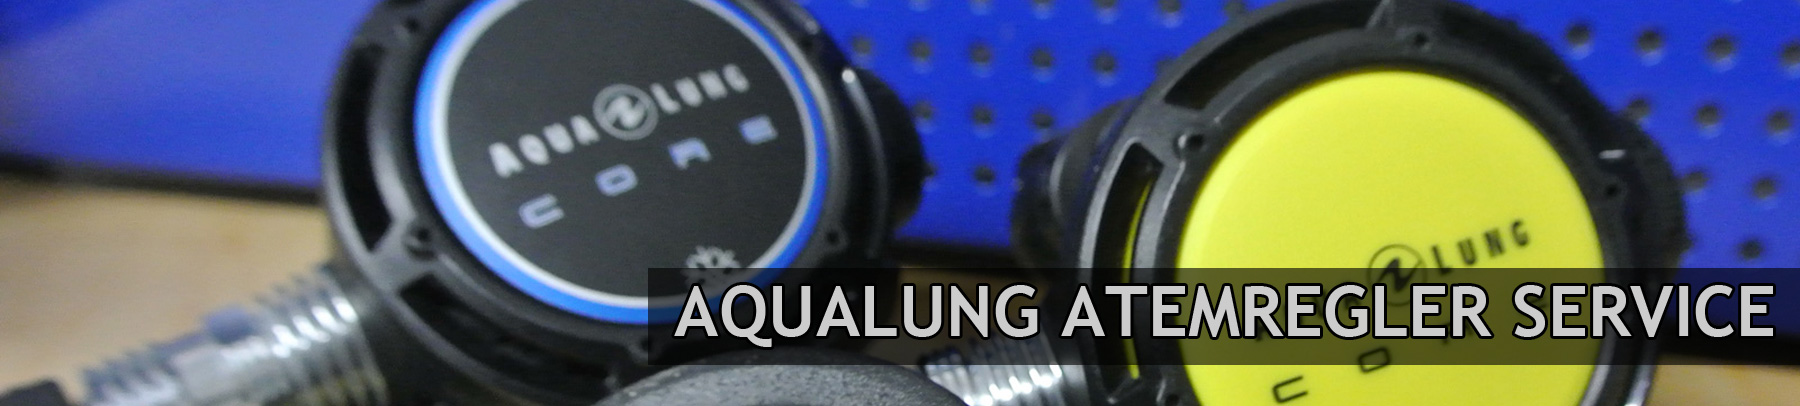 Aqualung-Atemregler-Service-Banner-Detailseite